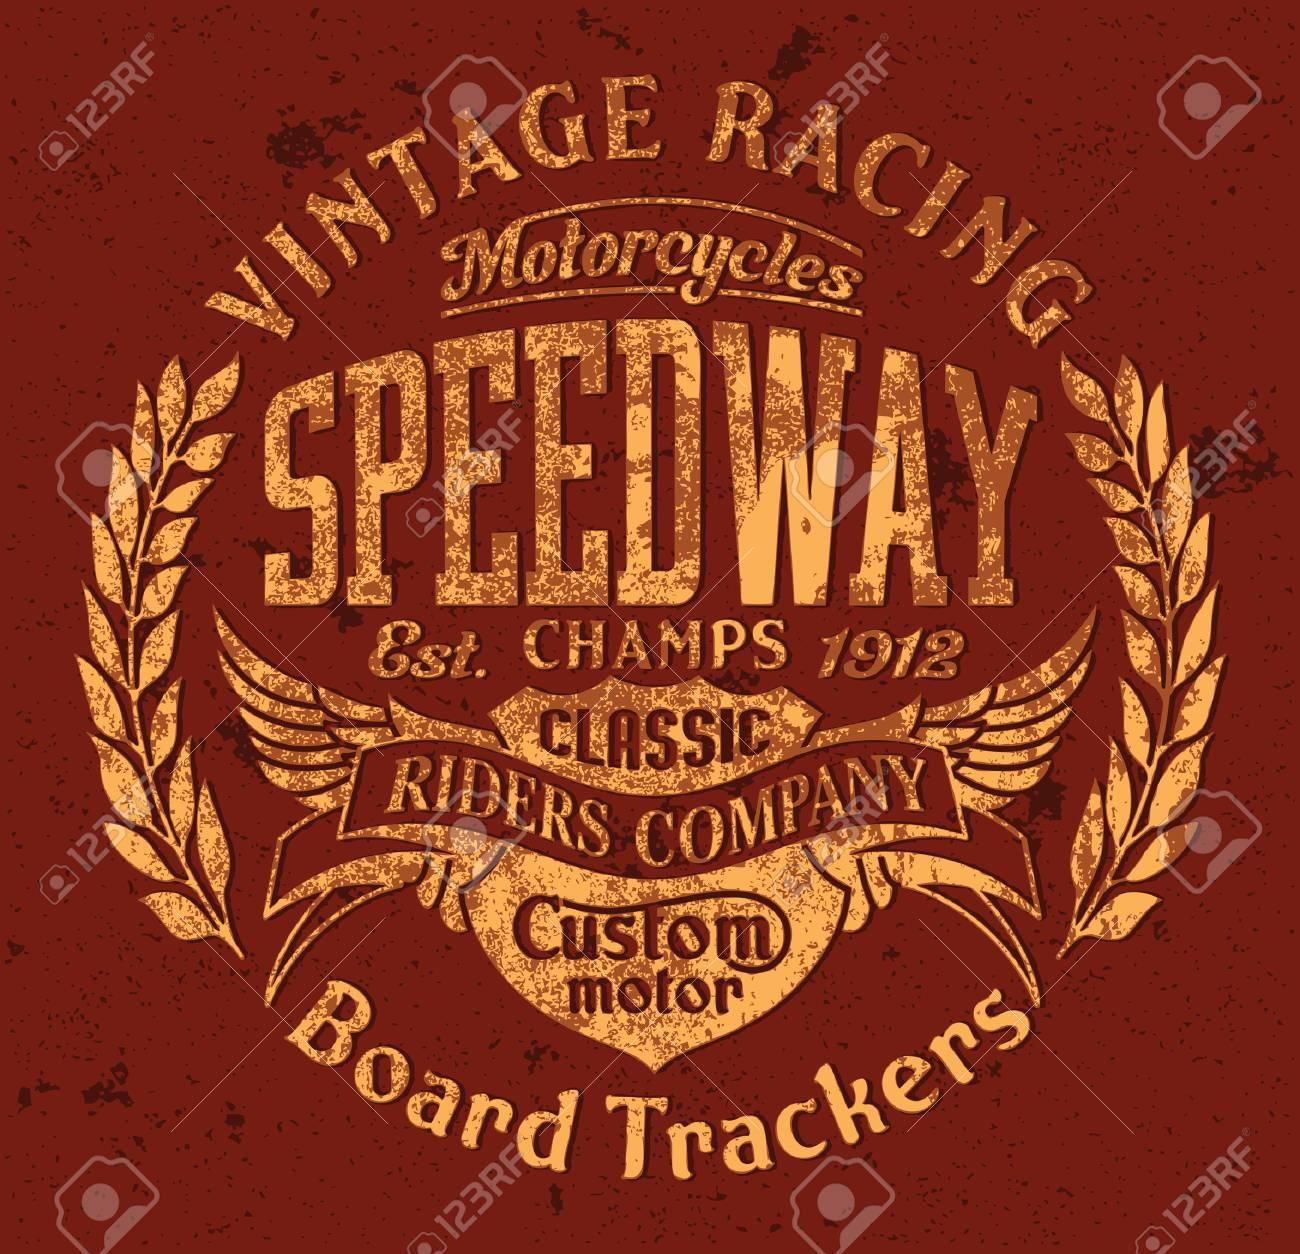 board tracker speedway motorcycle racing team vector vintage